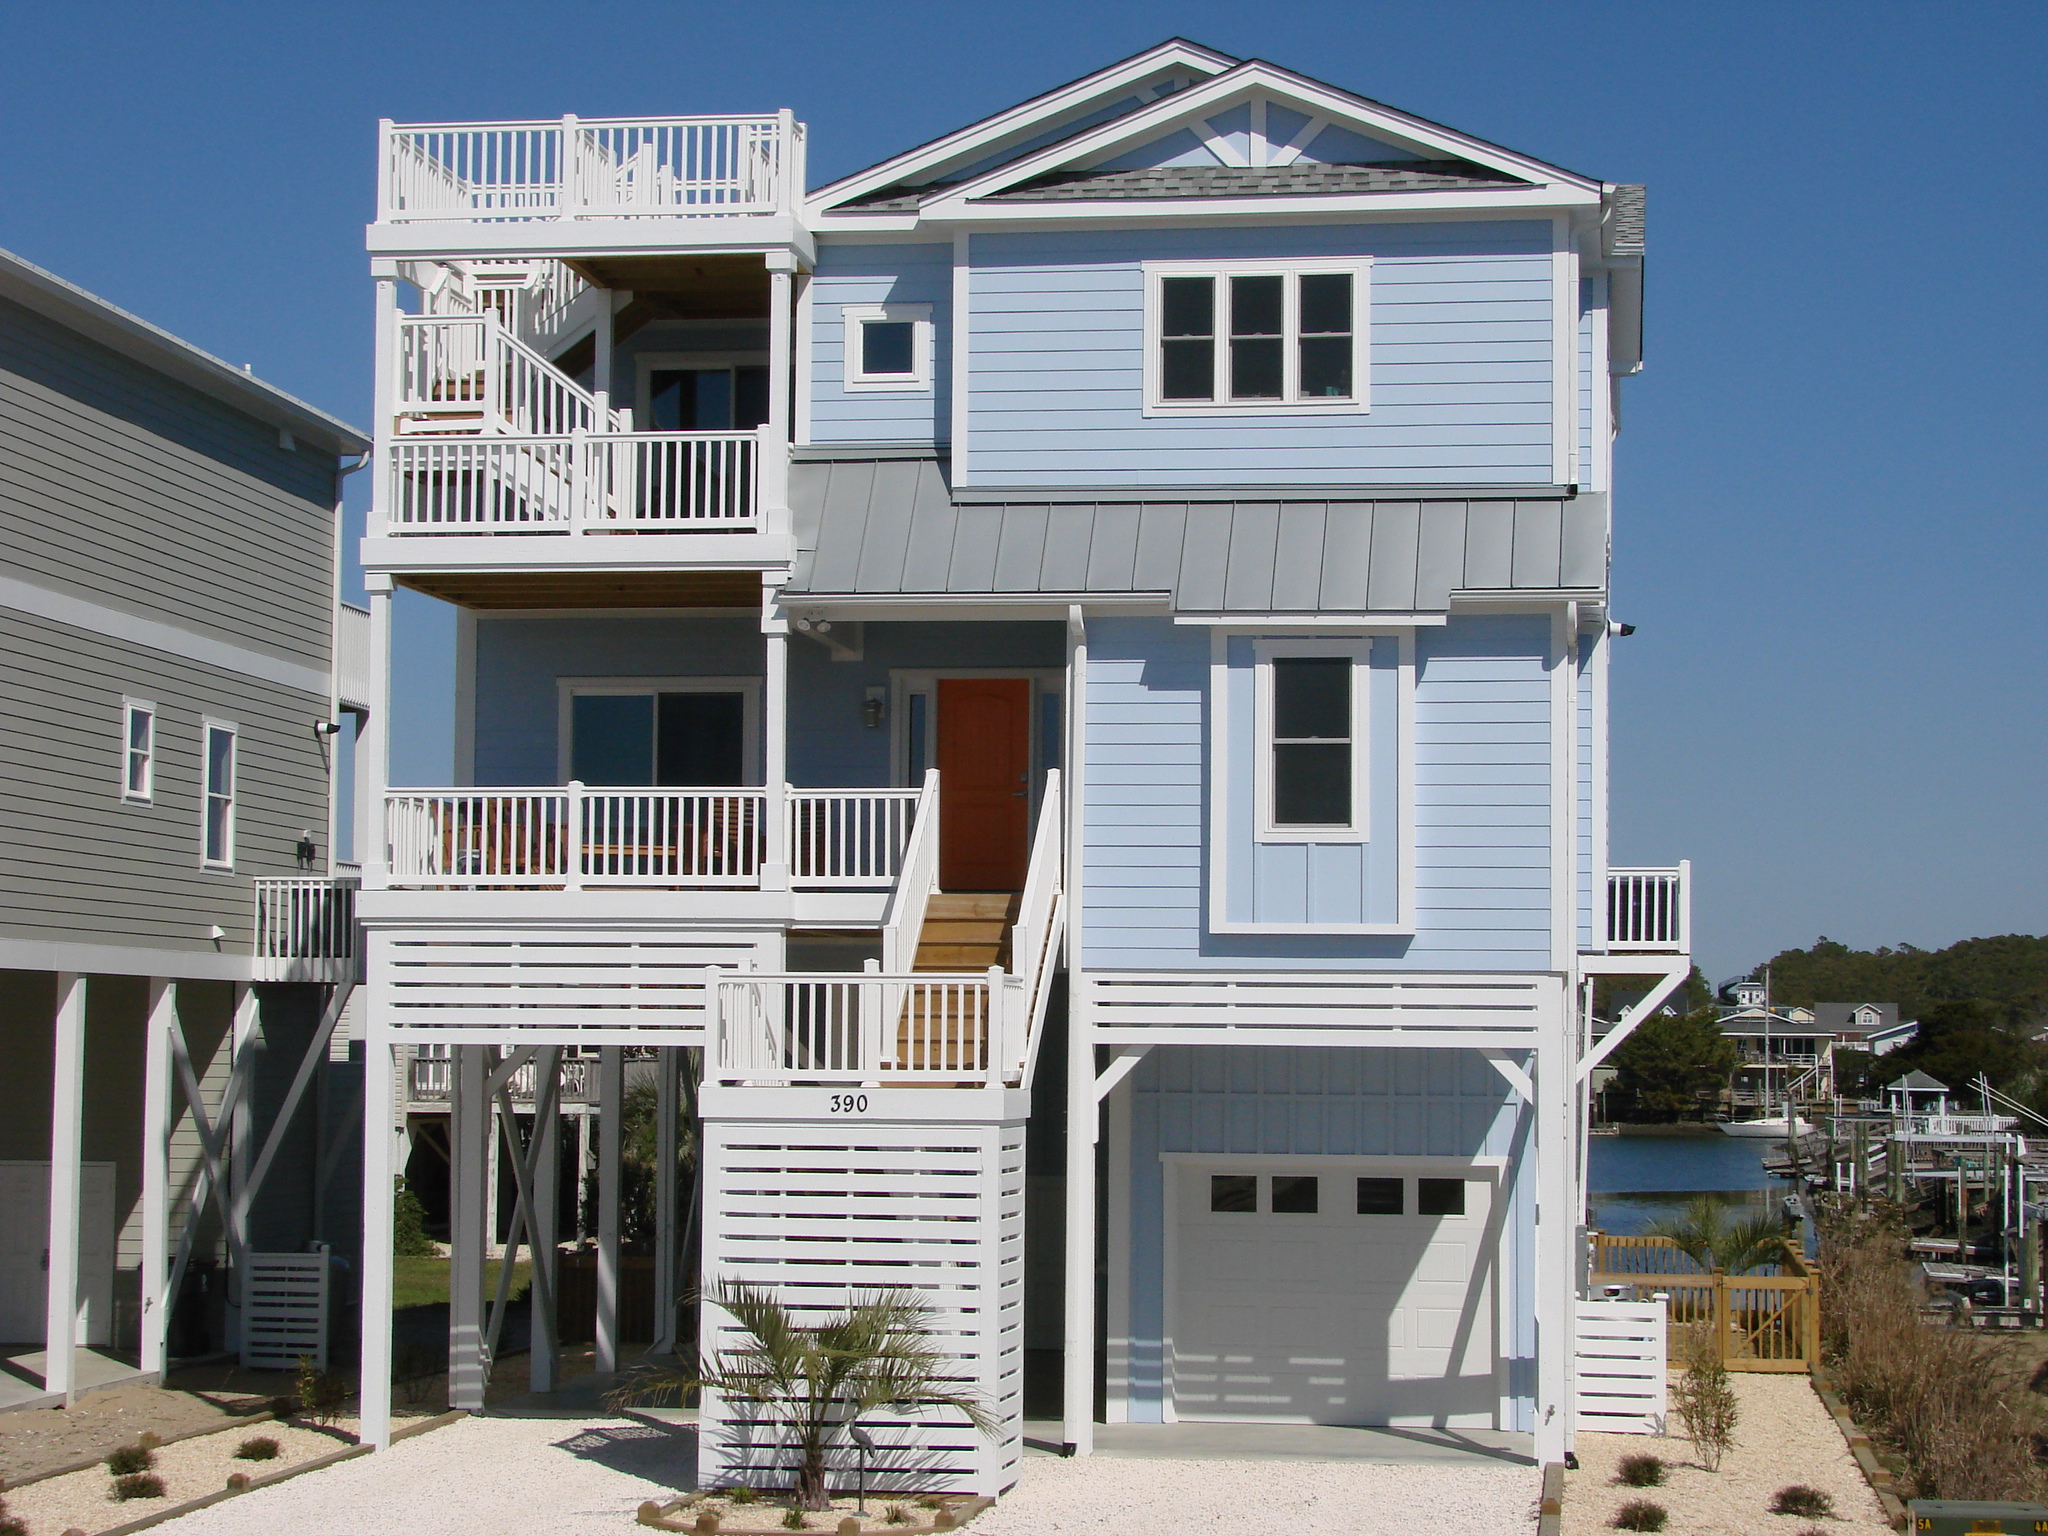 Charles Fox Homes Custom Homes And Building Design Ocean Isle - Custom homes design